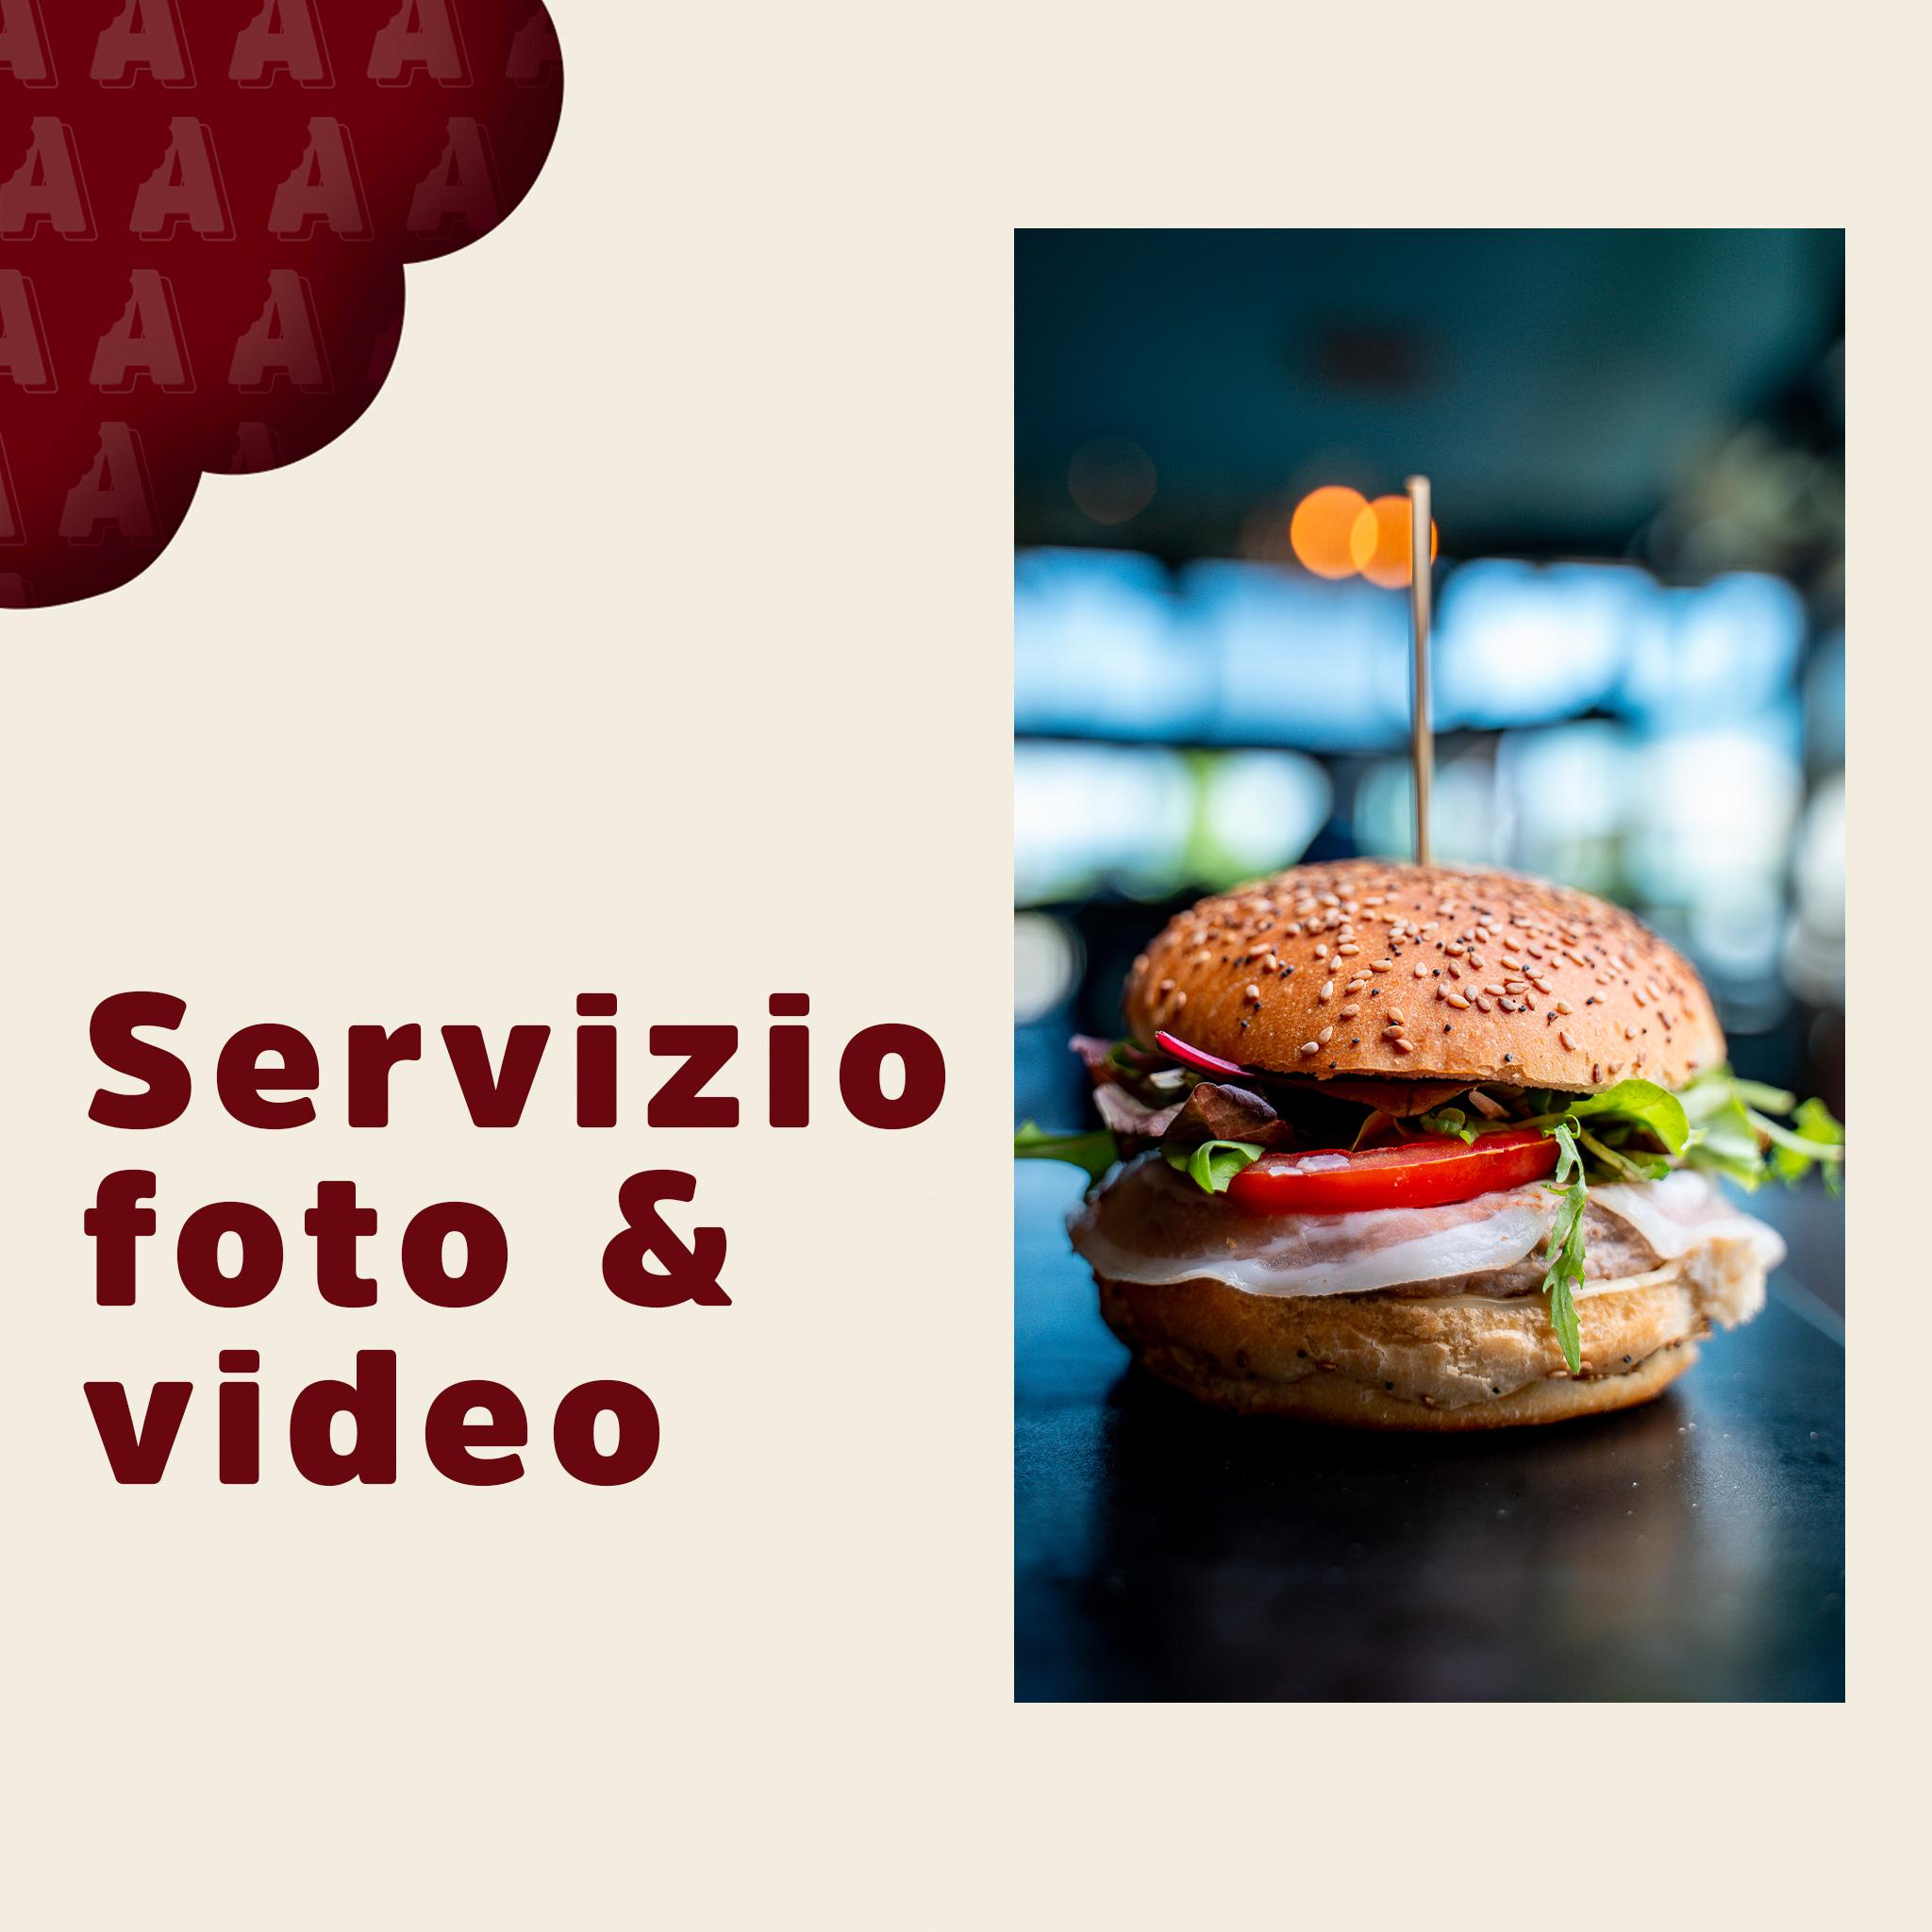 cirkus-cafè-vicenza-6